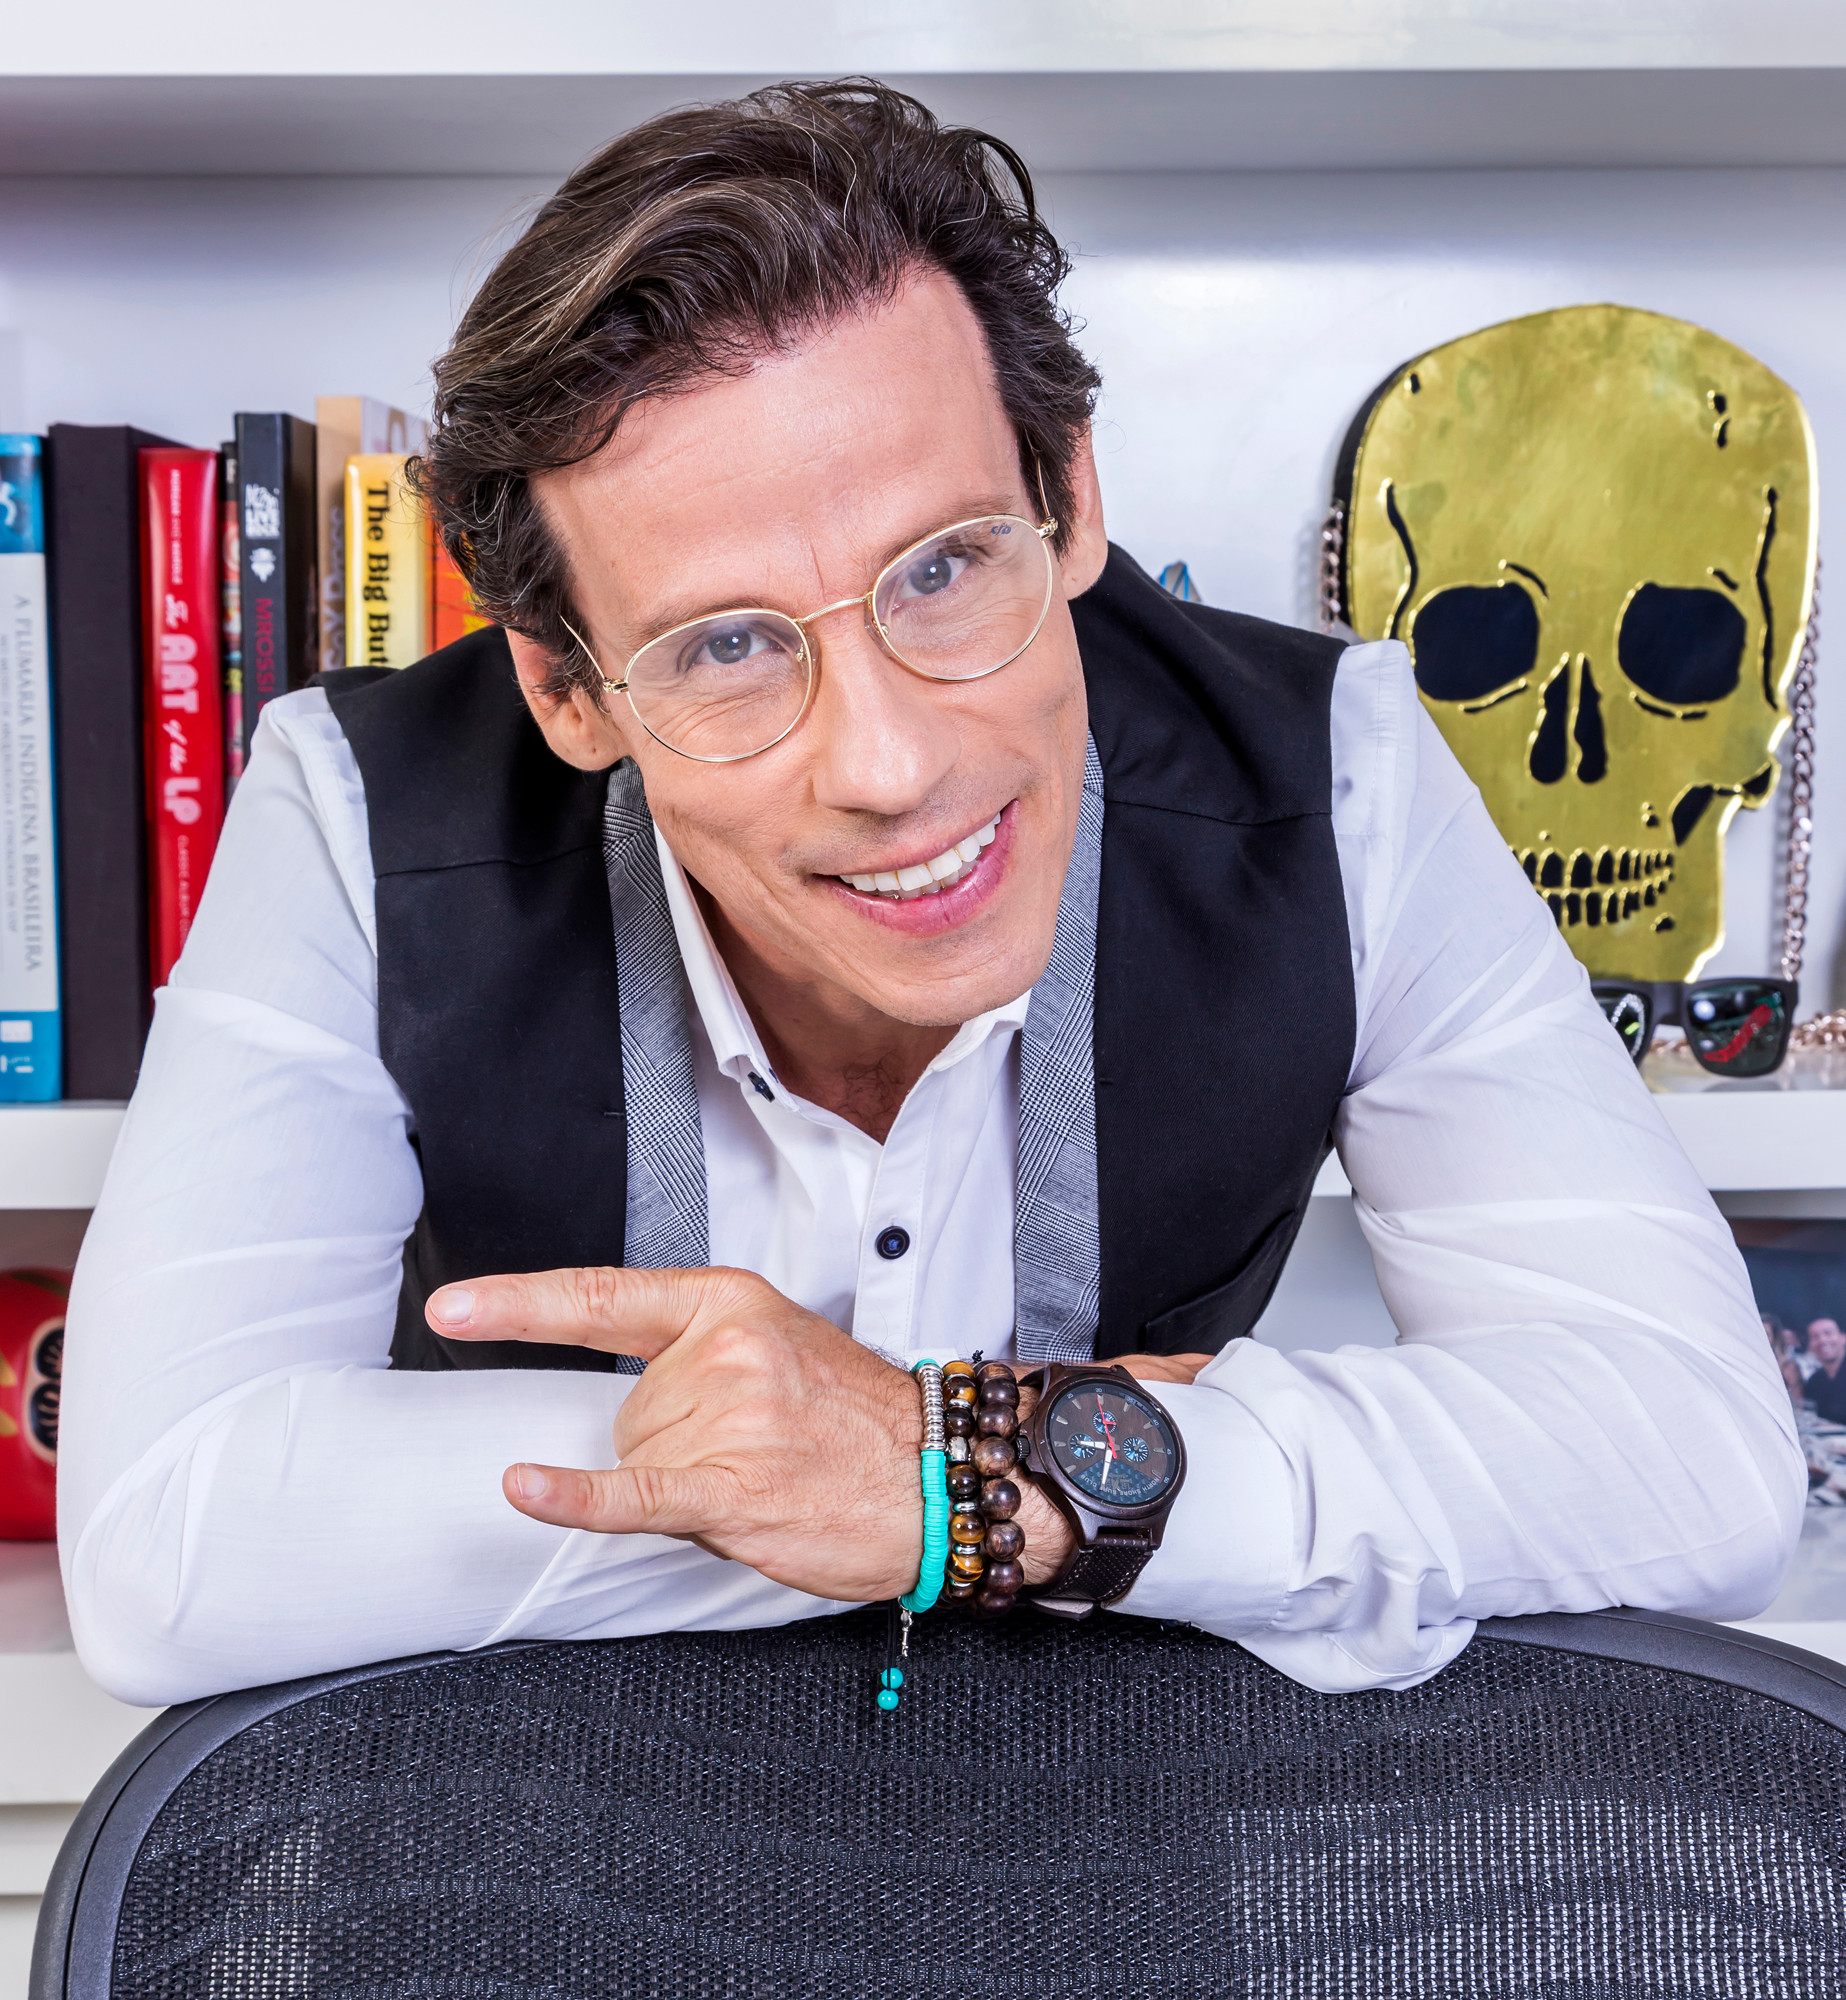 Business portrait of Caito Maia